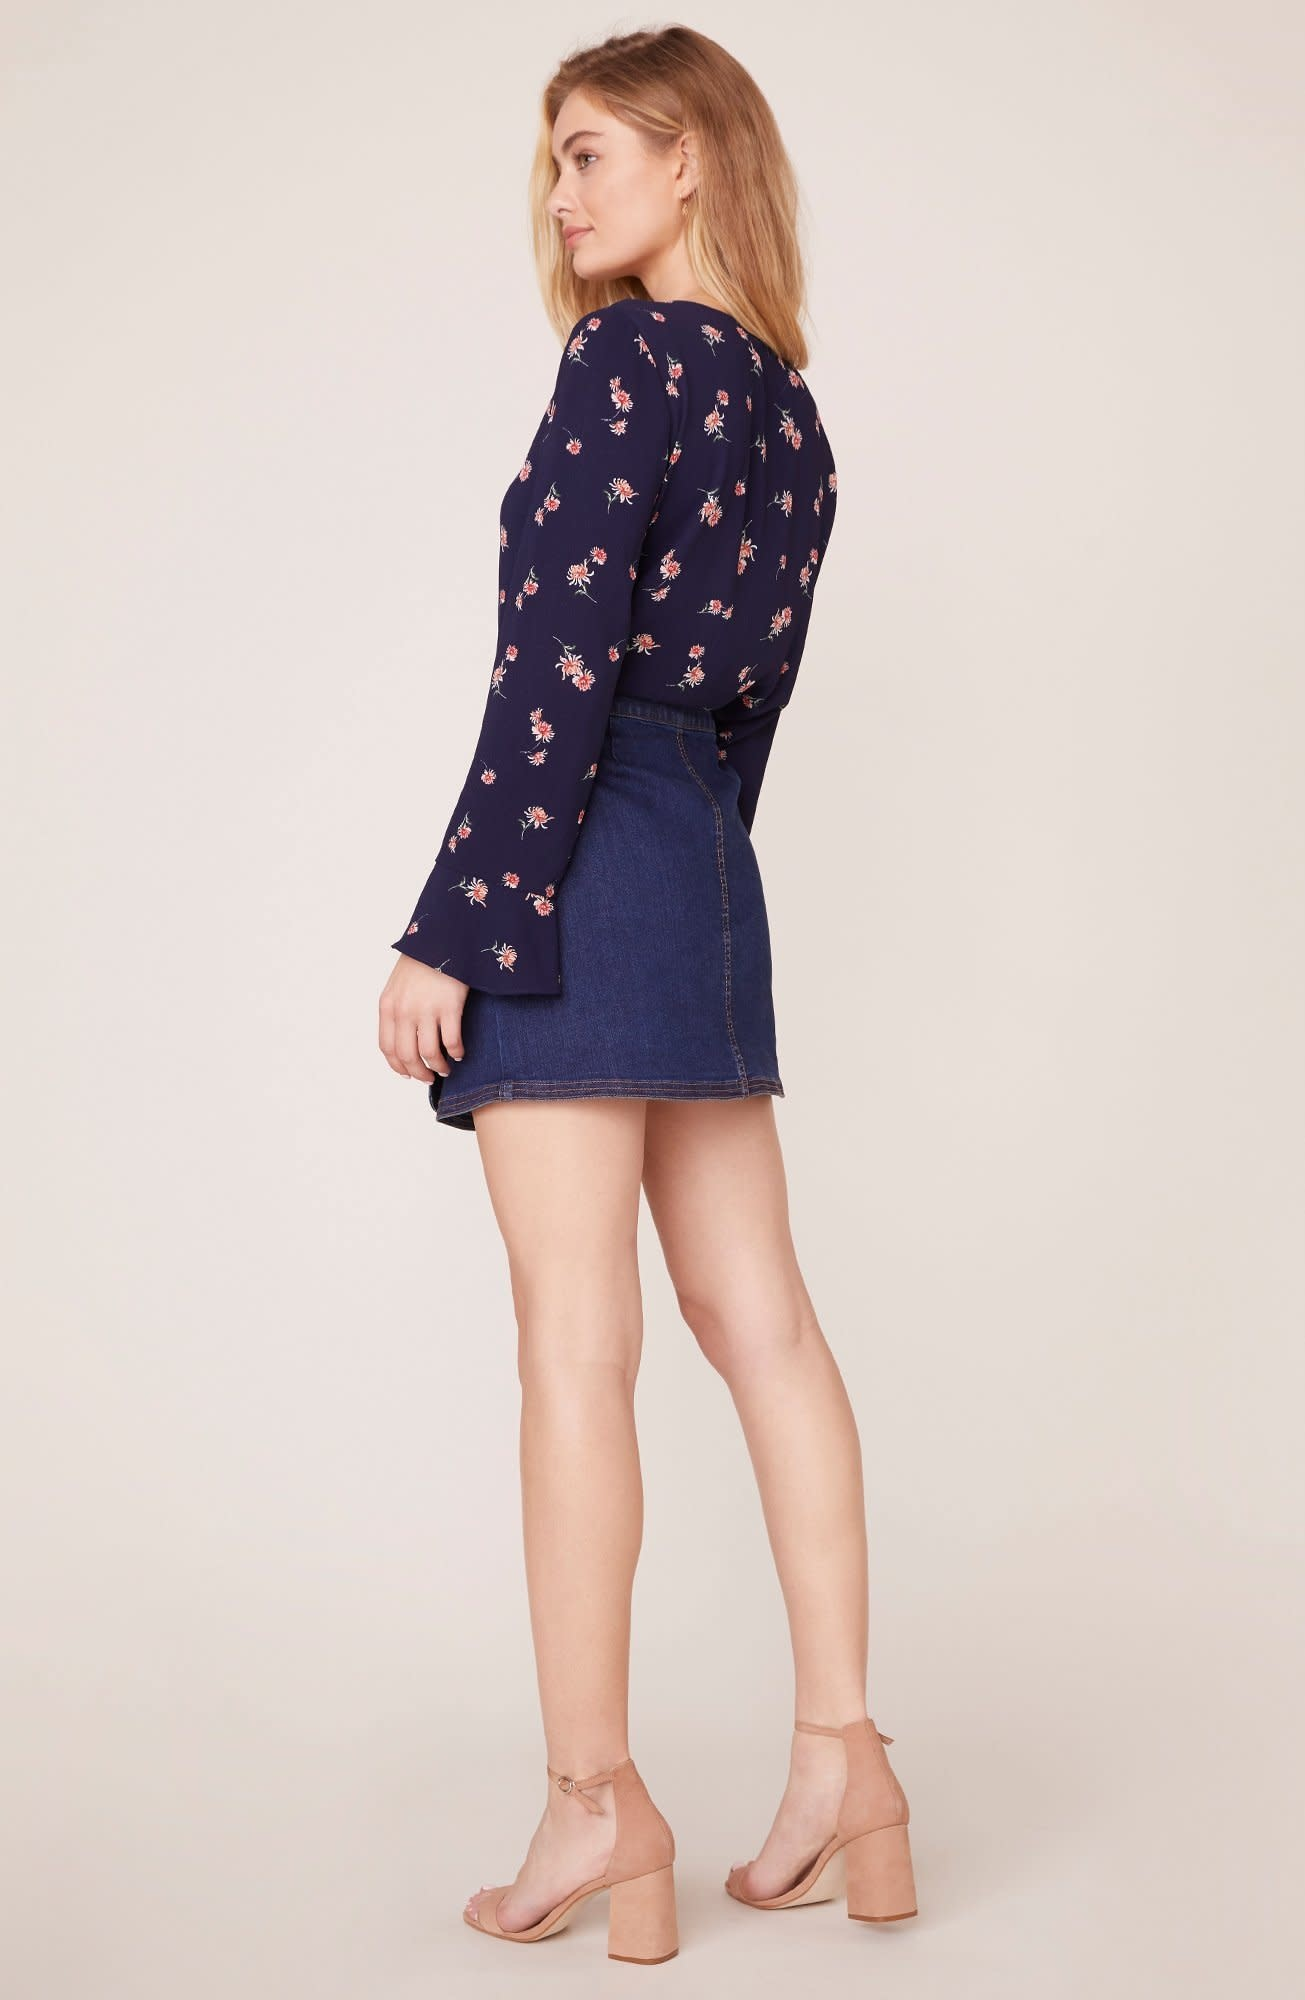 BB Dakota Dream Jeannie Denim Wrap Skirt